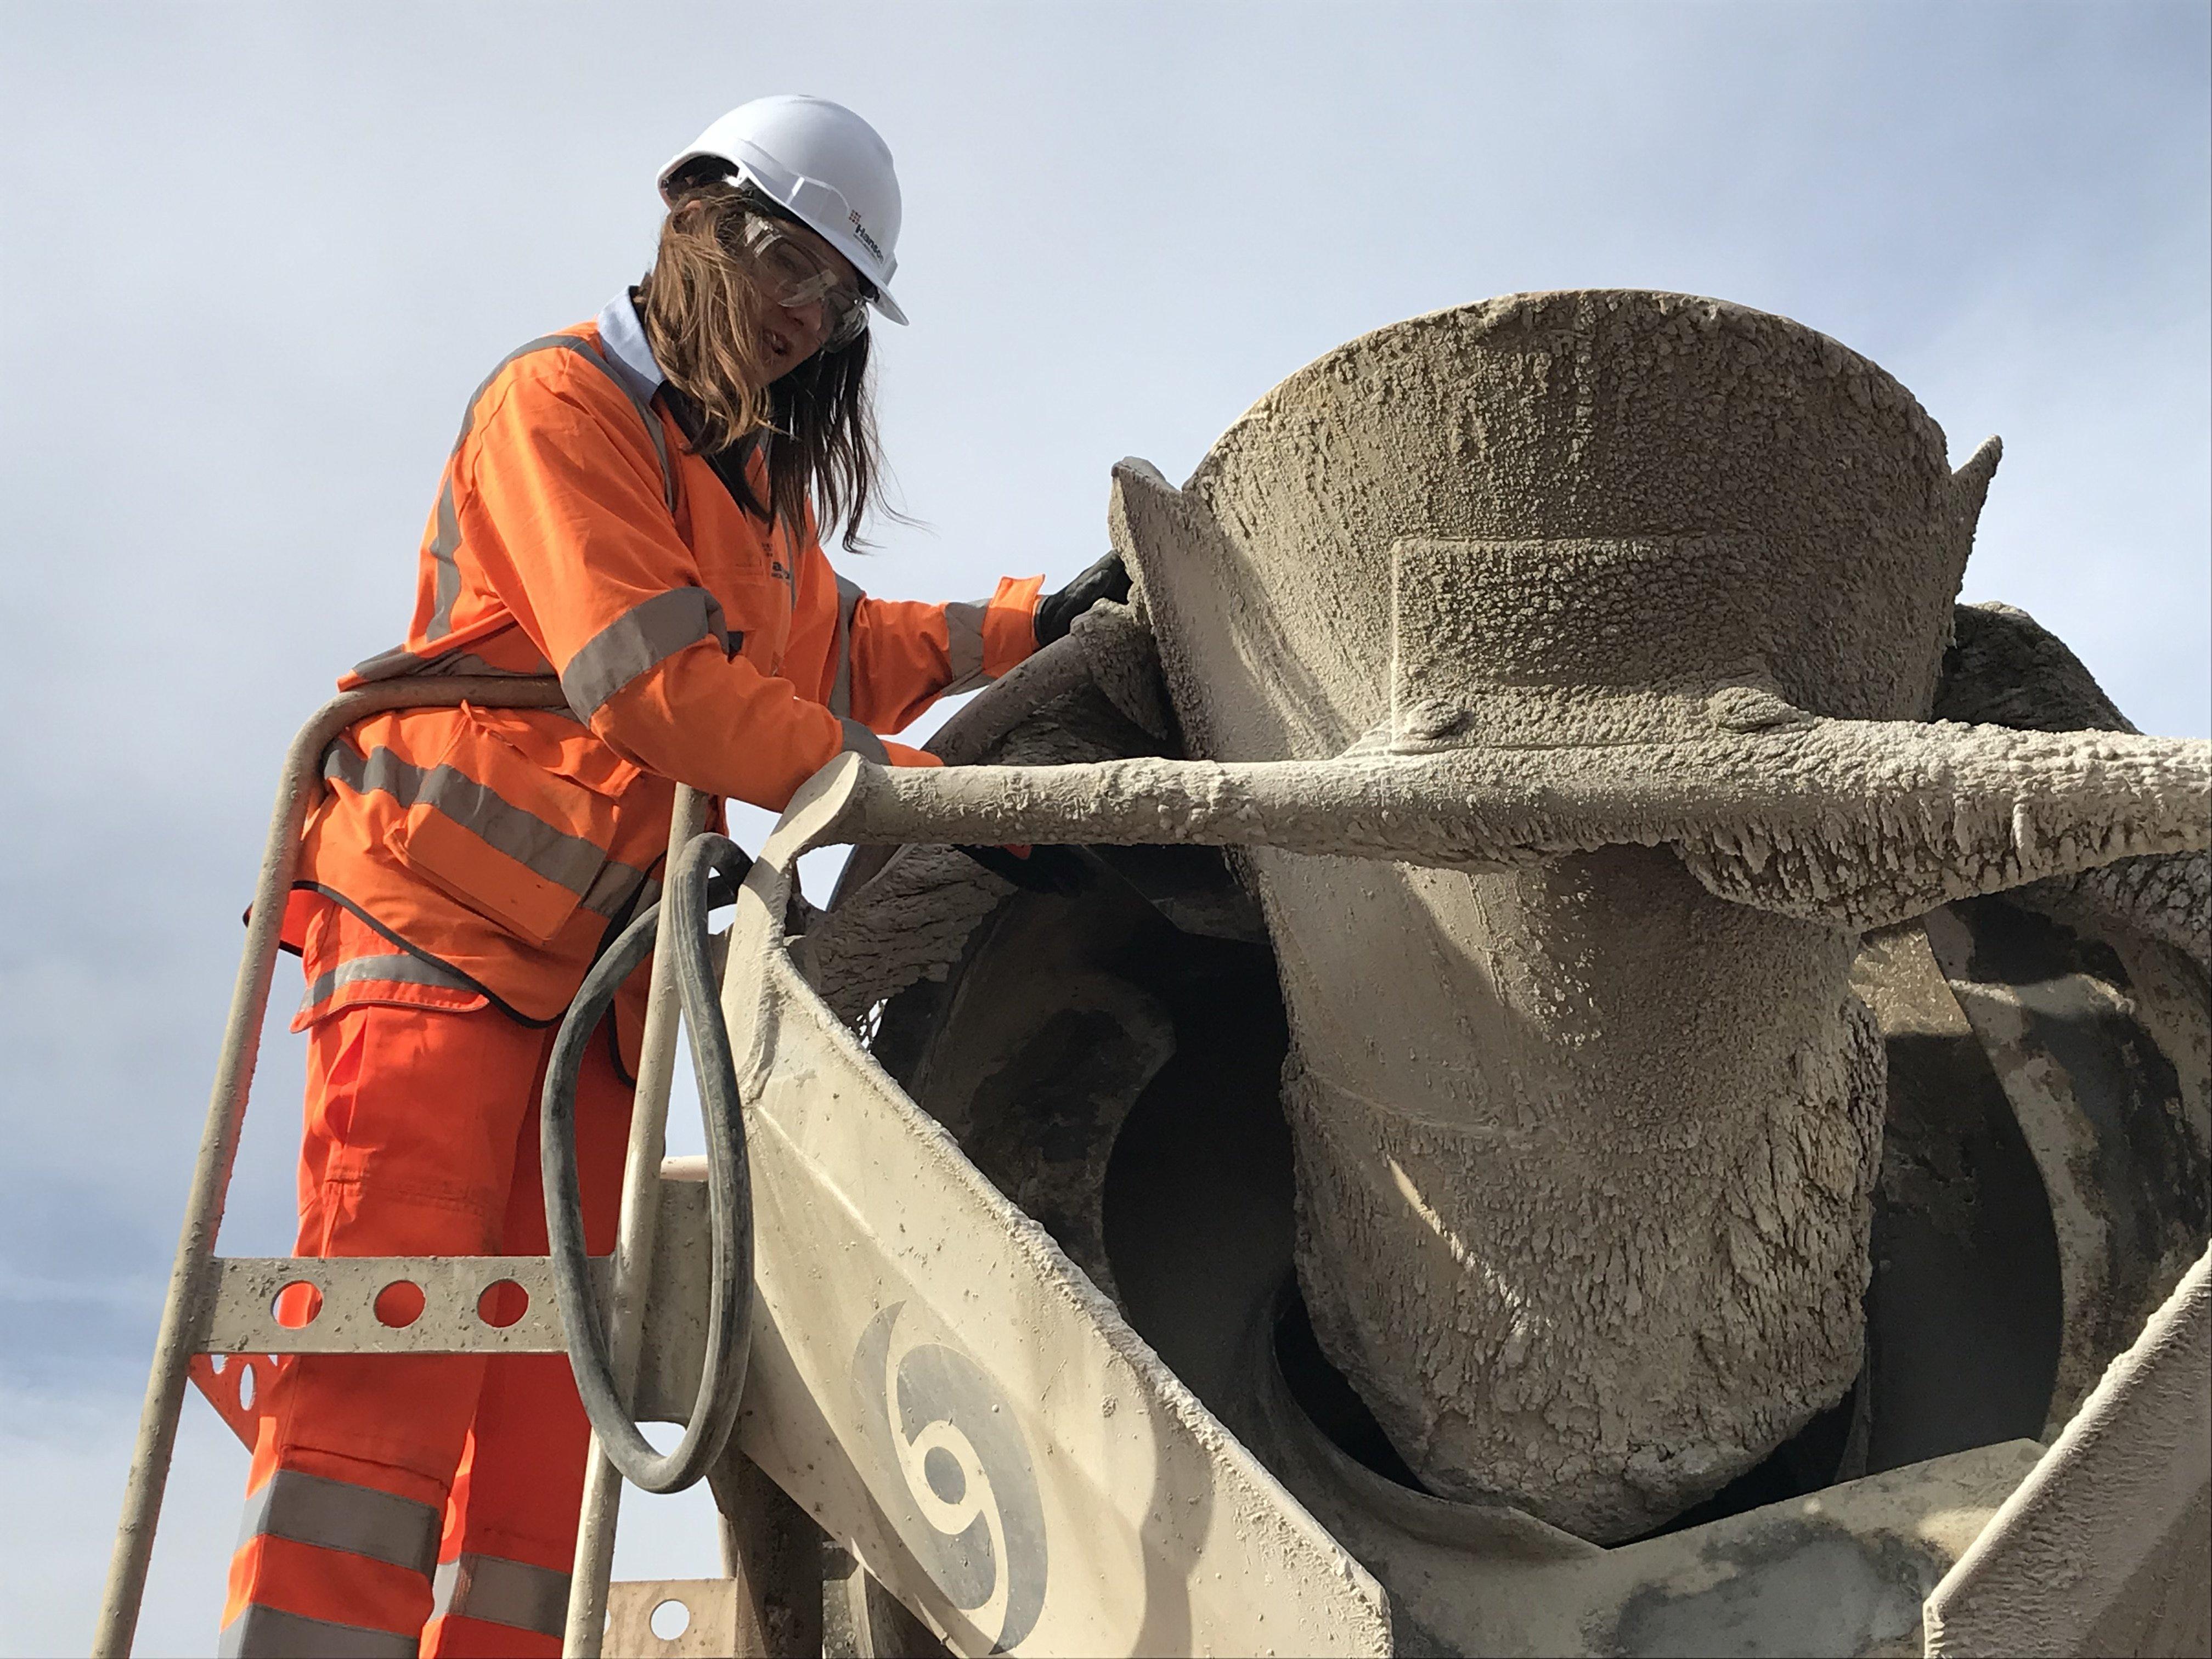 Emily Burridge inspects a batch of concrete